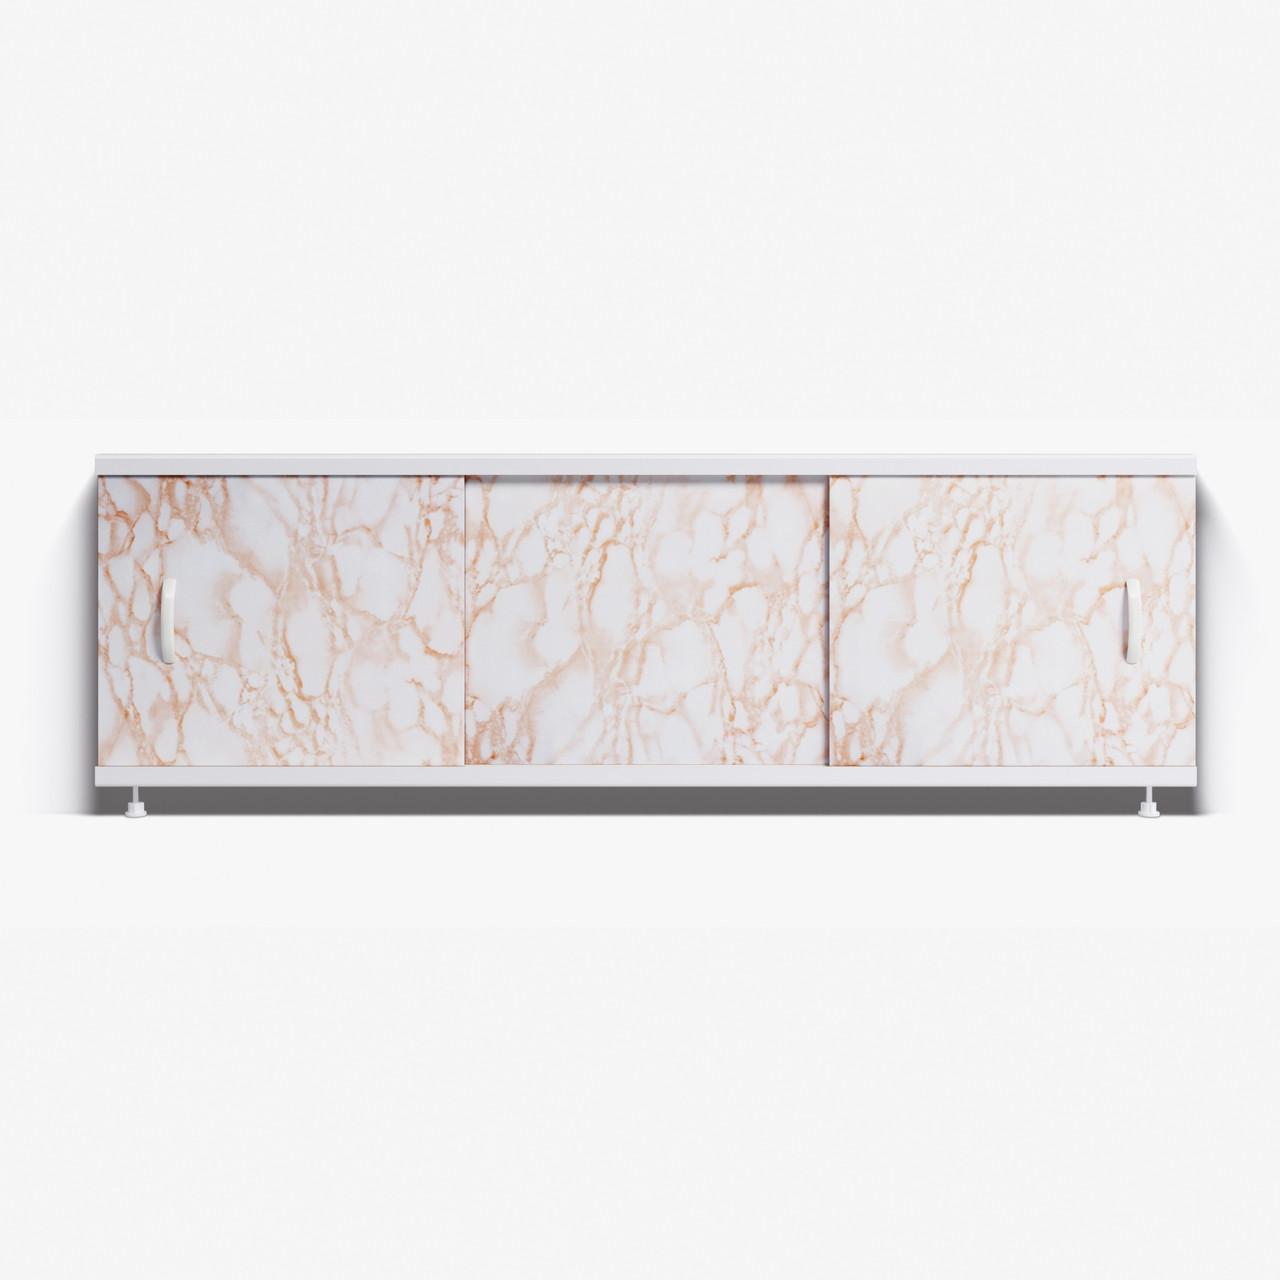 Панель для ванны Alavann Престиж 1.5 м  //  2-кремовый мрамор